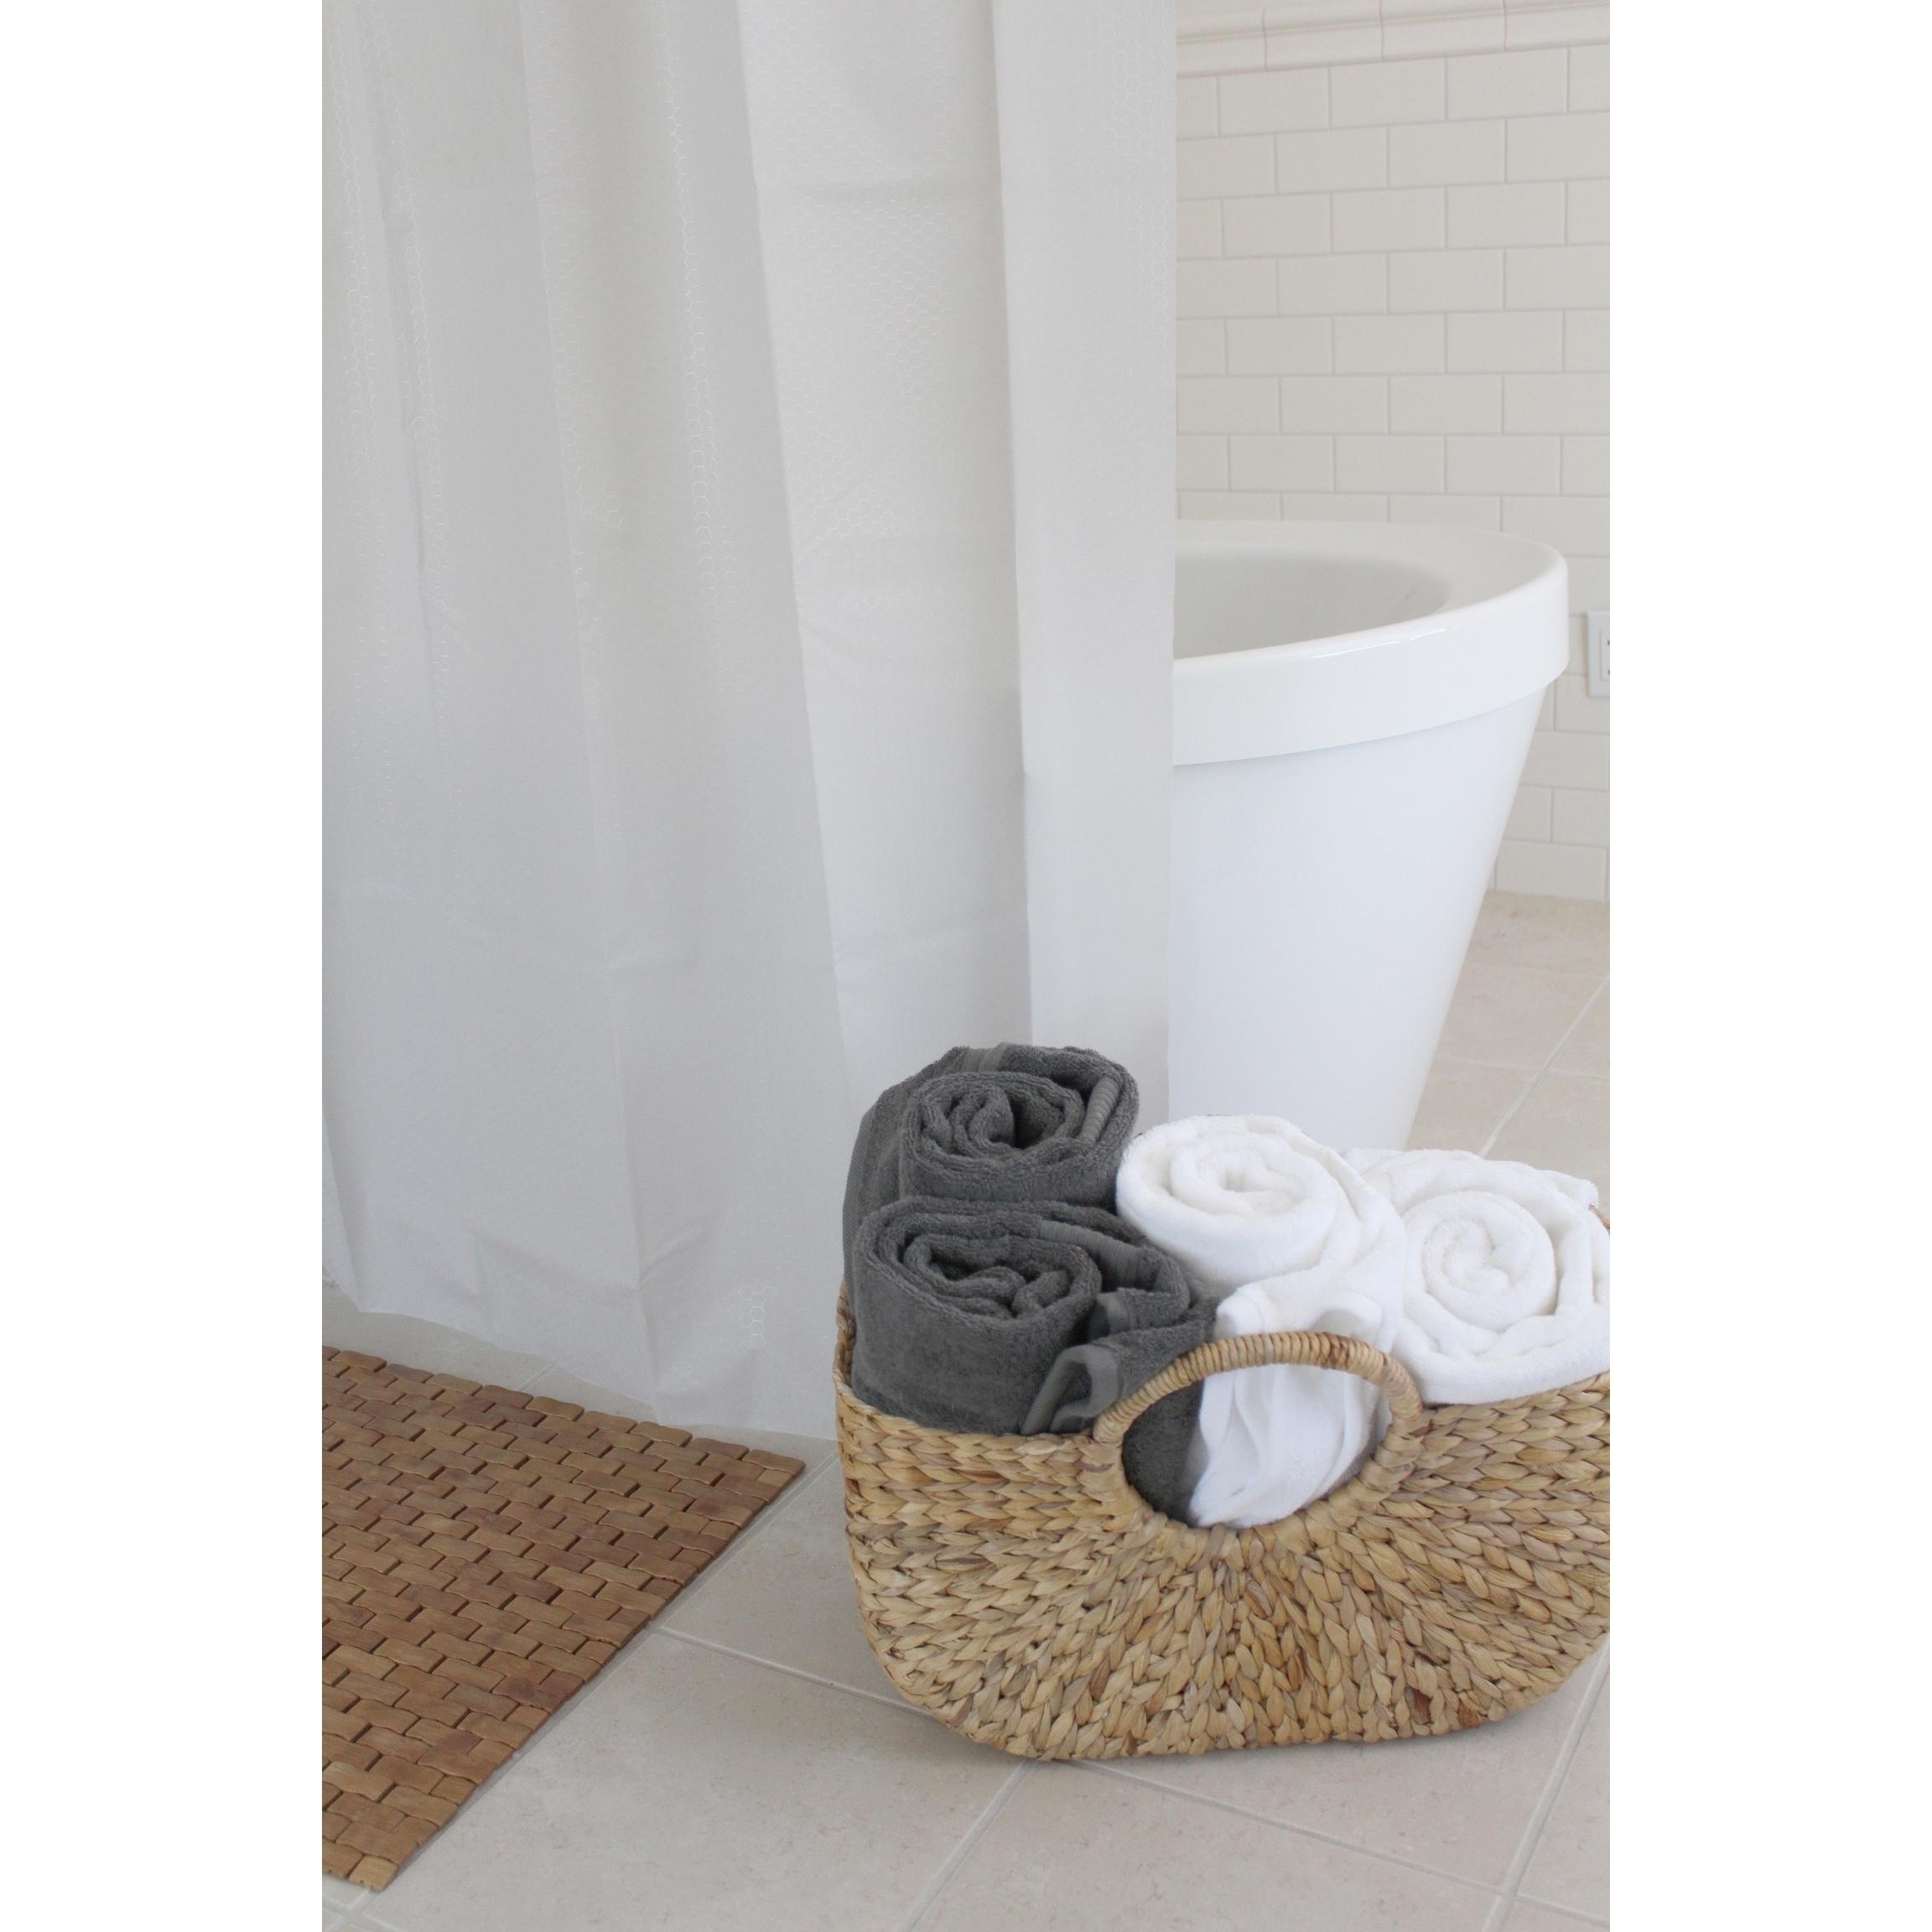 Shop Splash Home Motto PEVA Shower Curtain 72 X 70